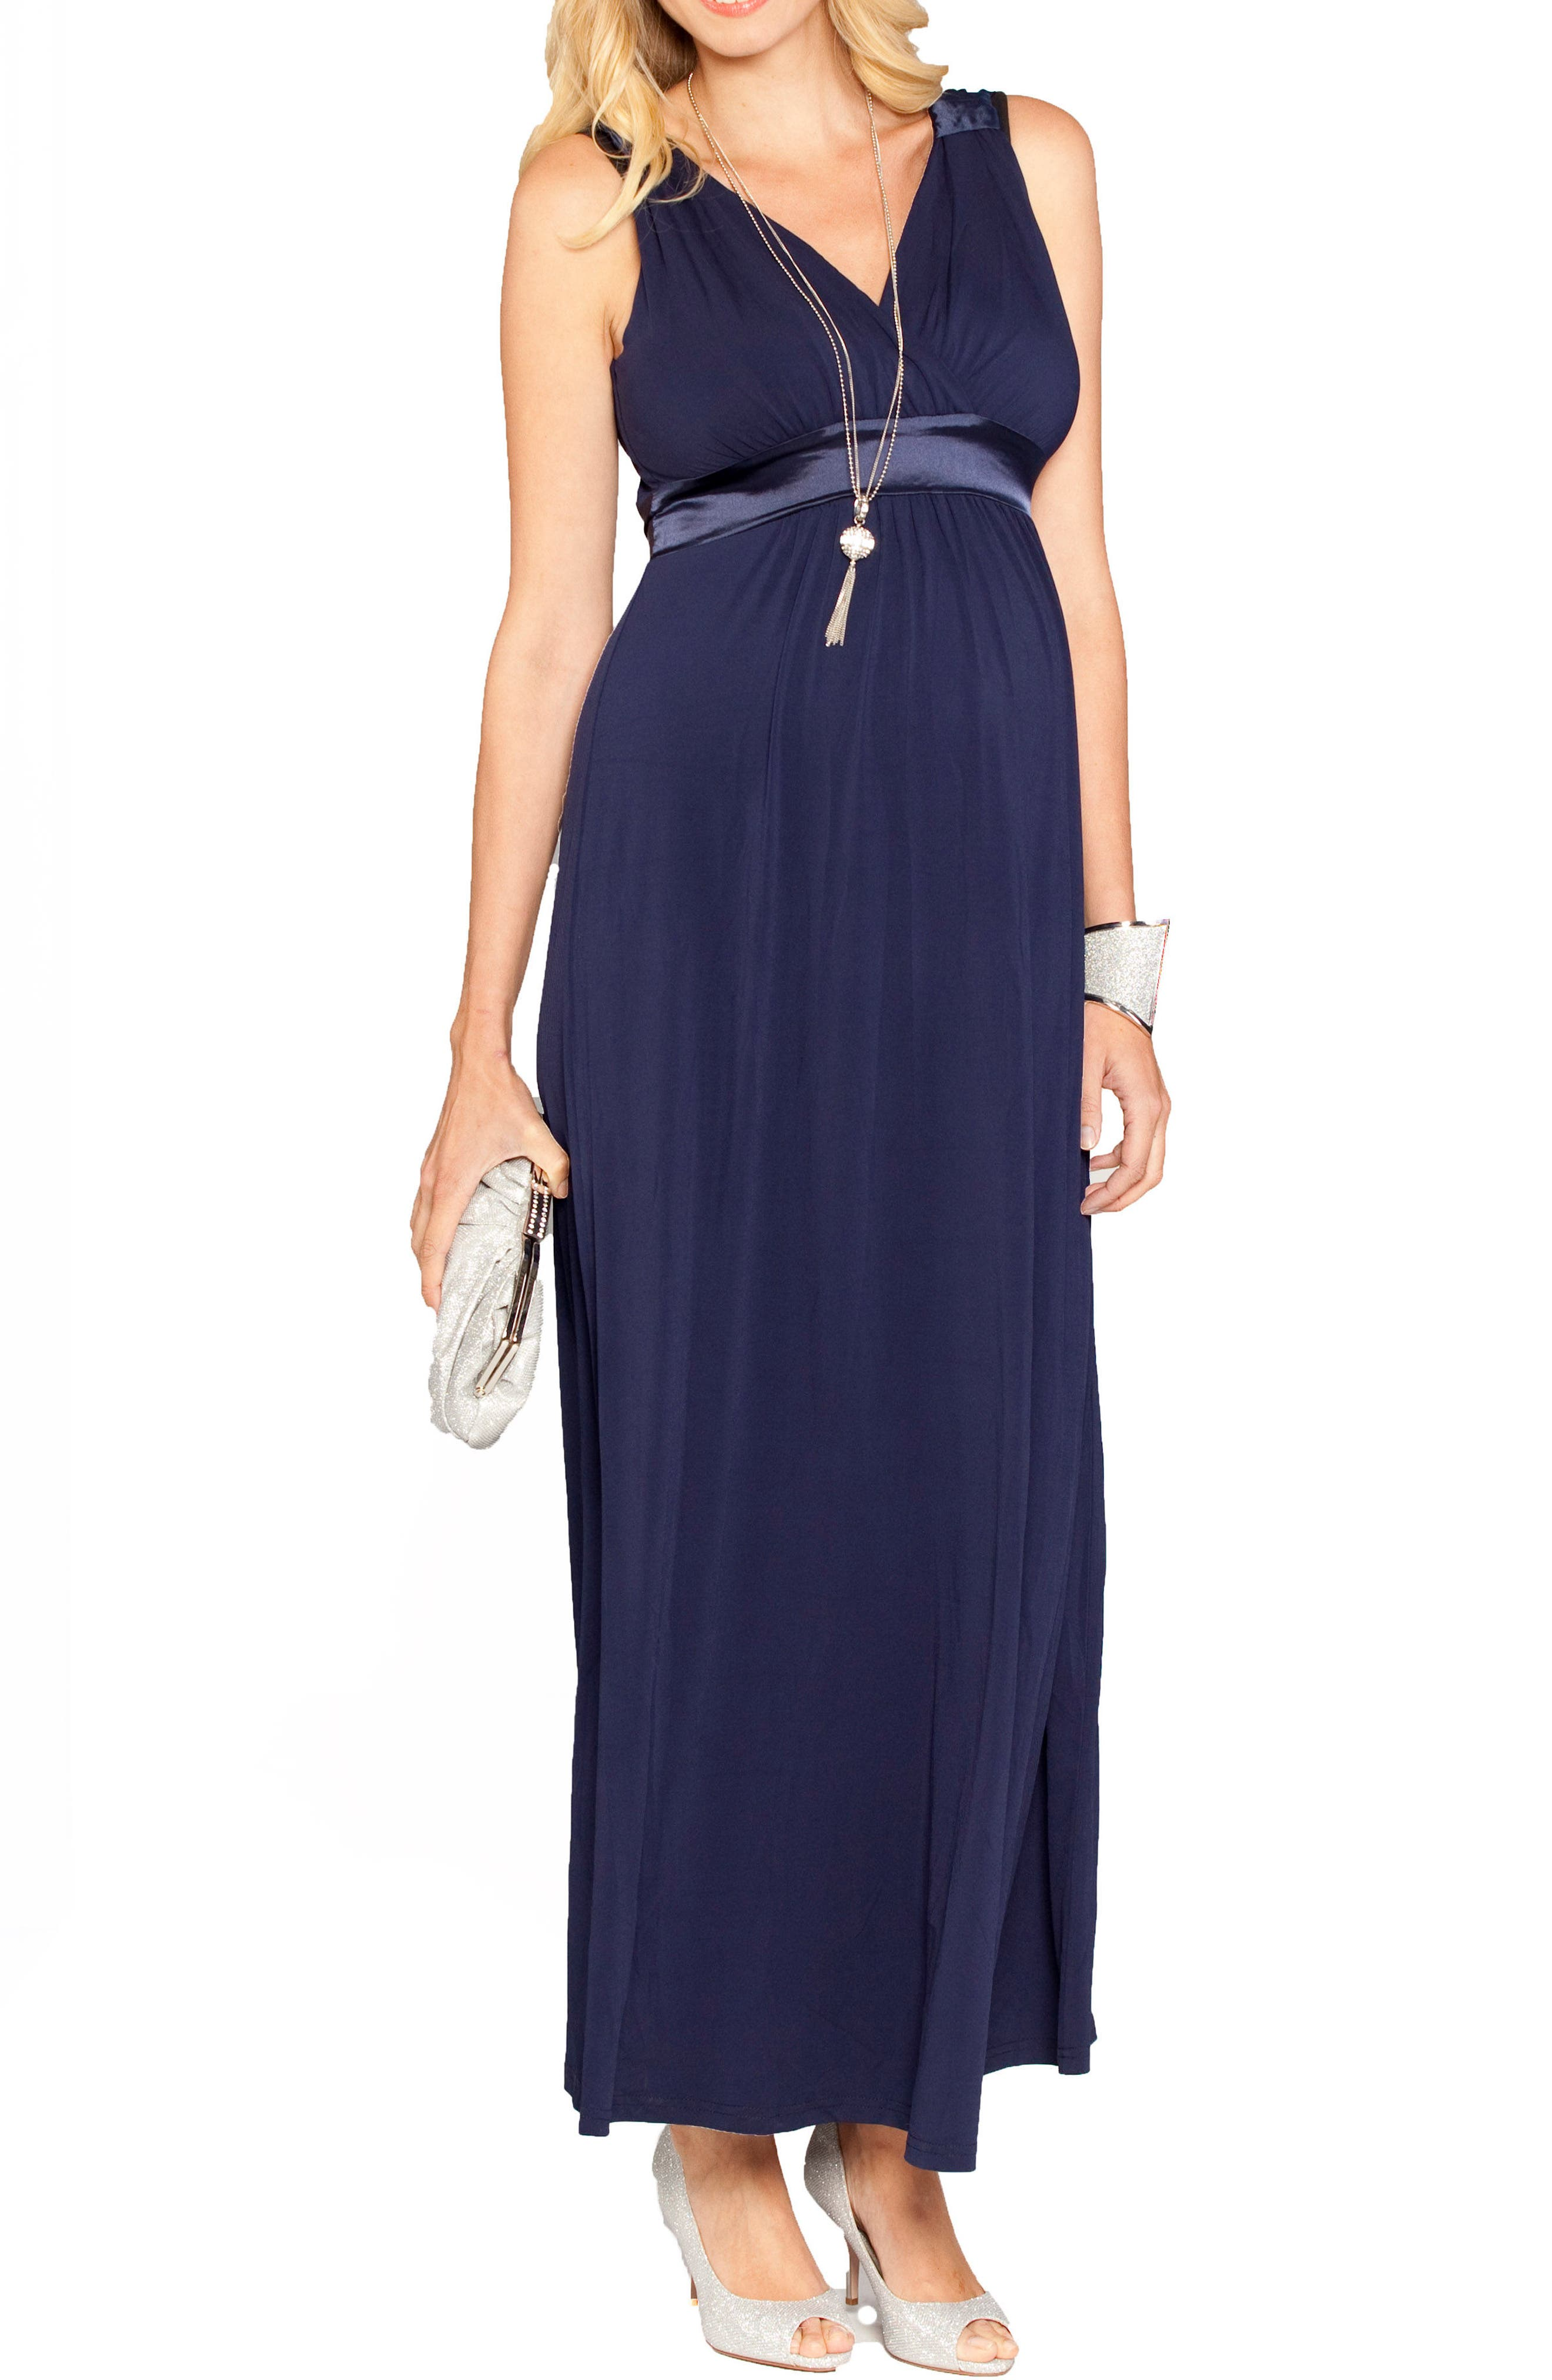 Satin Trim Maternity Dress,                         Main,                         color, DARK NAVY